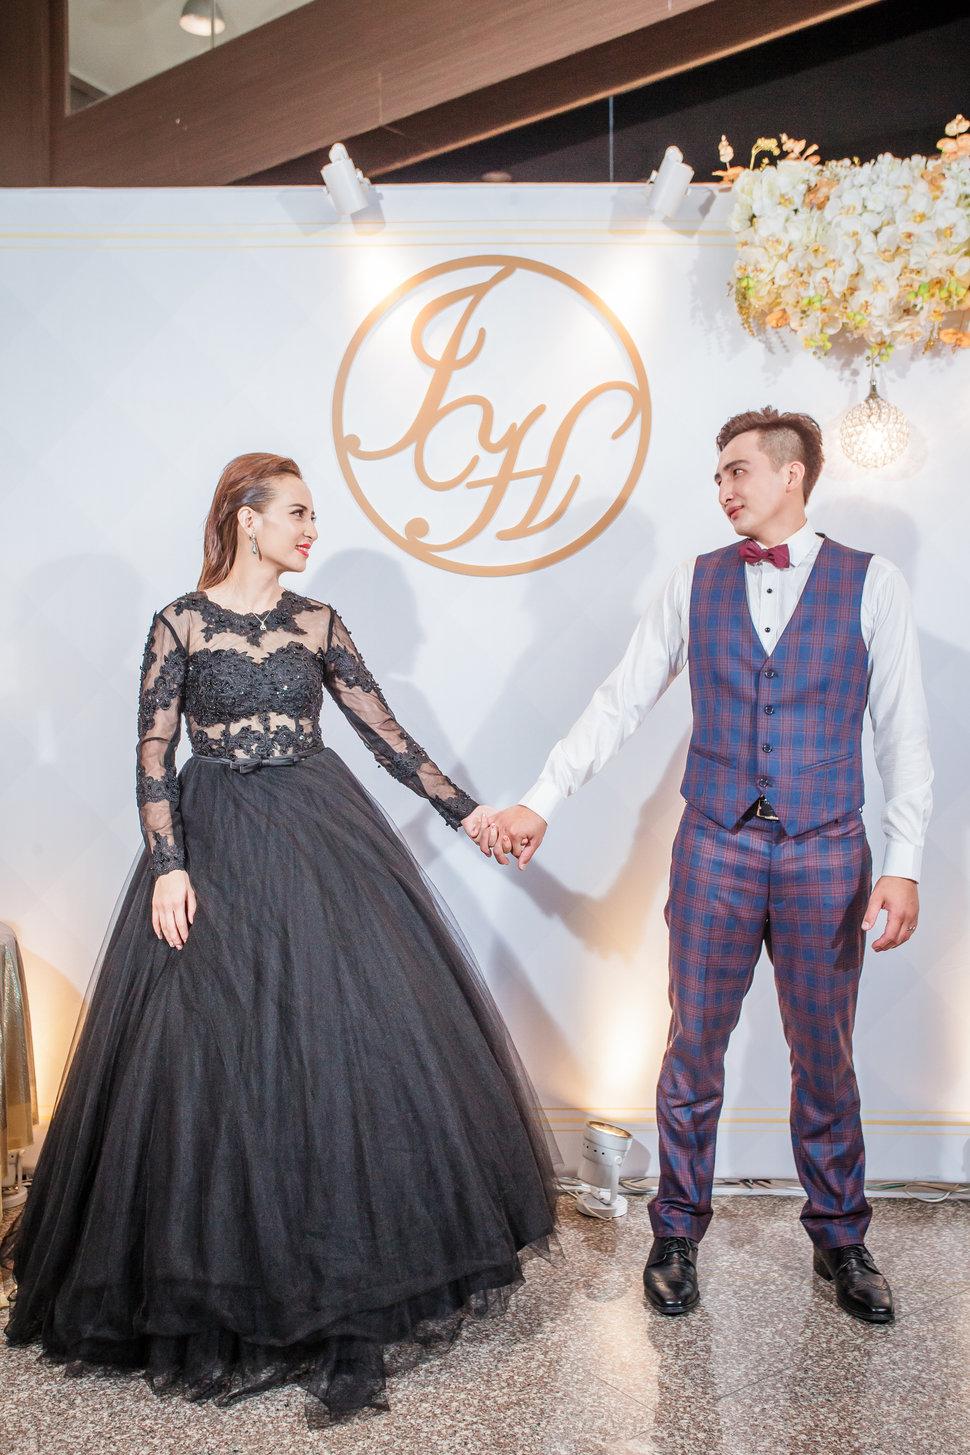 wedding-891 - J-Love 婚禮攝影團隊 - 結婚吧